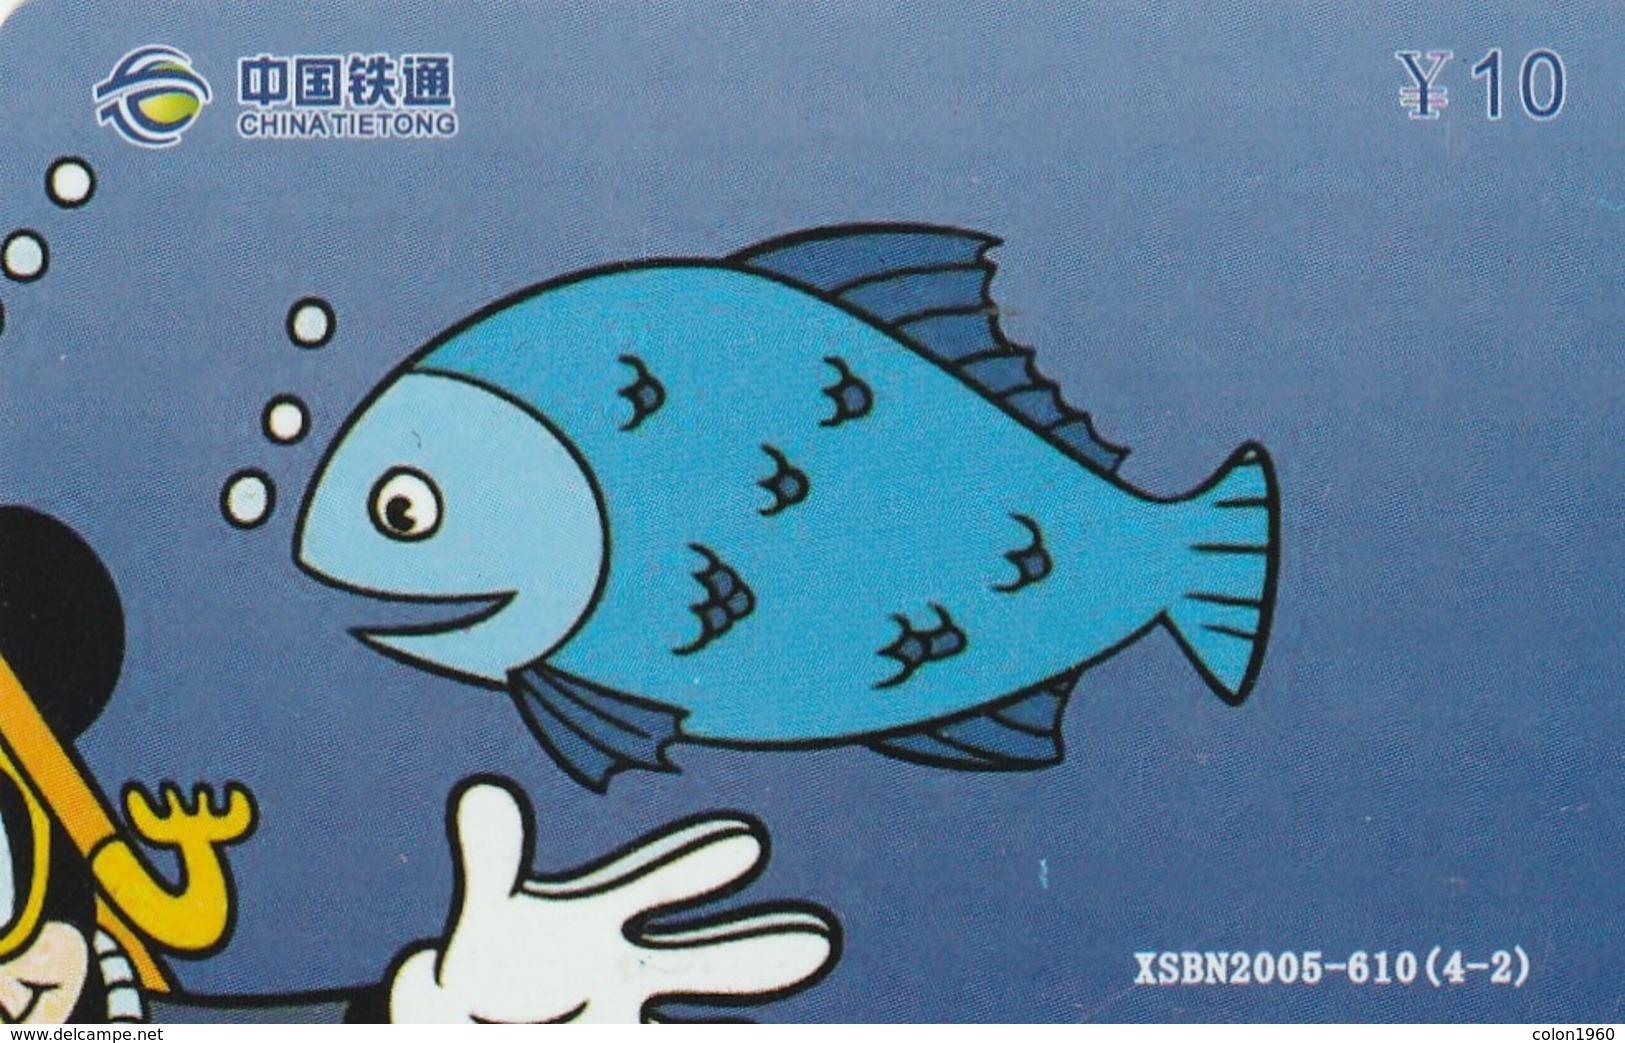 CHINA. DISNEY, COCA COLA. MICKEY MOUSE. XSBN2005-610(4-2). (140). - Puzzles